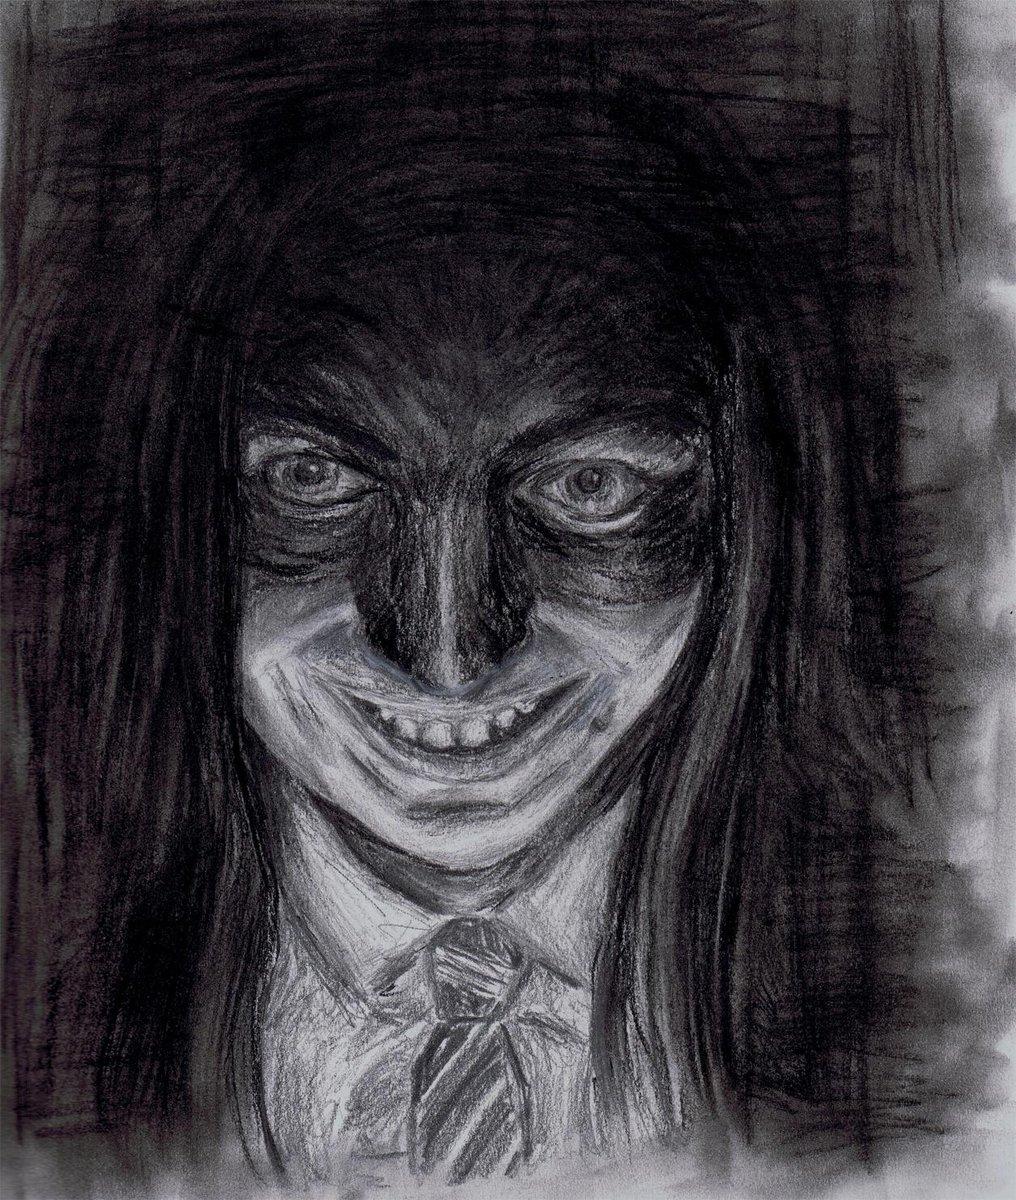 Sir John Lawes Art On Twitter Dramatic Lighting Homework Sketch By Lilly R Y10 CSE Student Tco AXkO3BOFMm